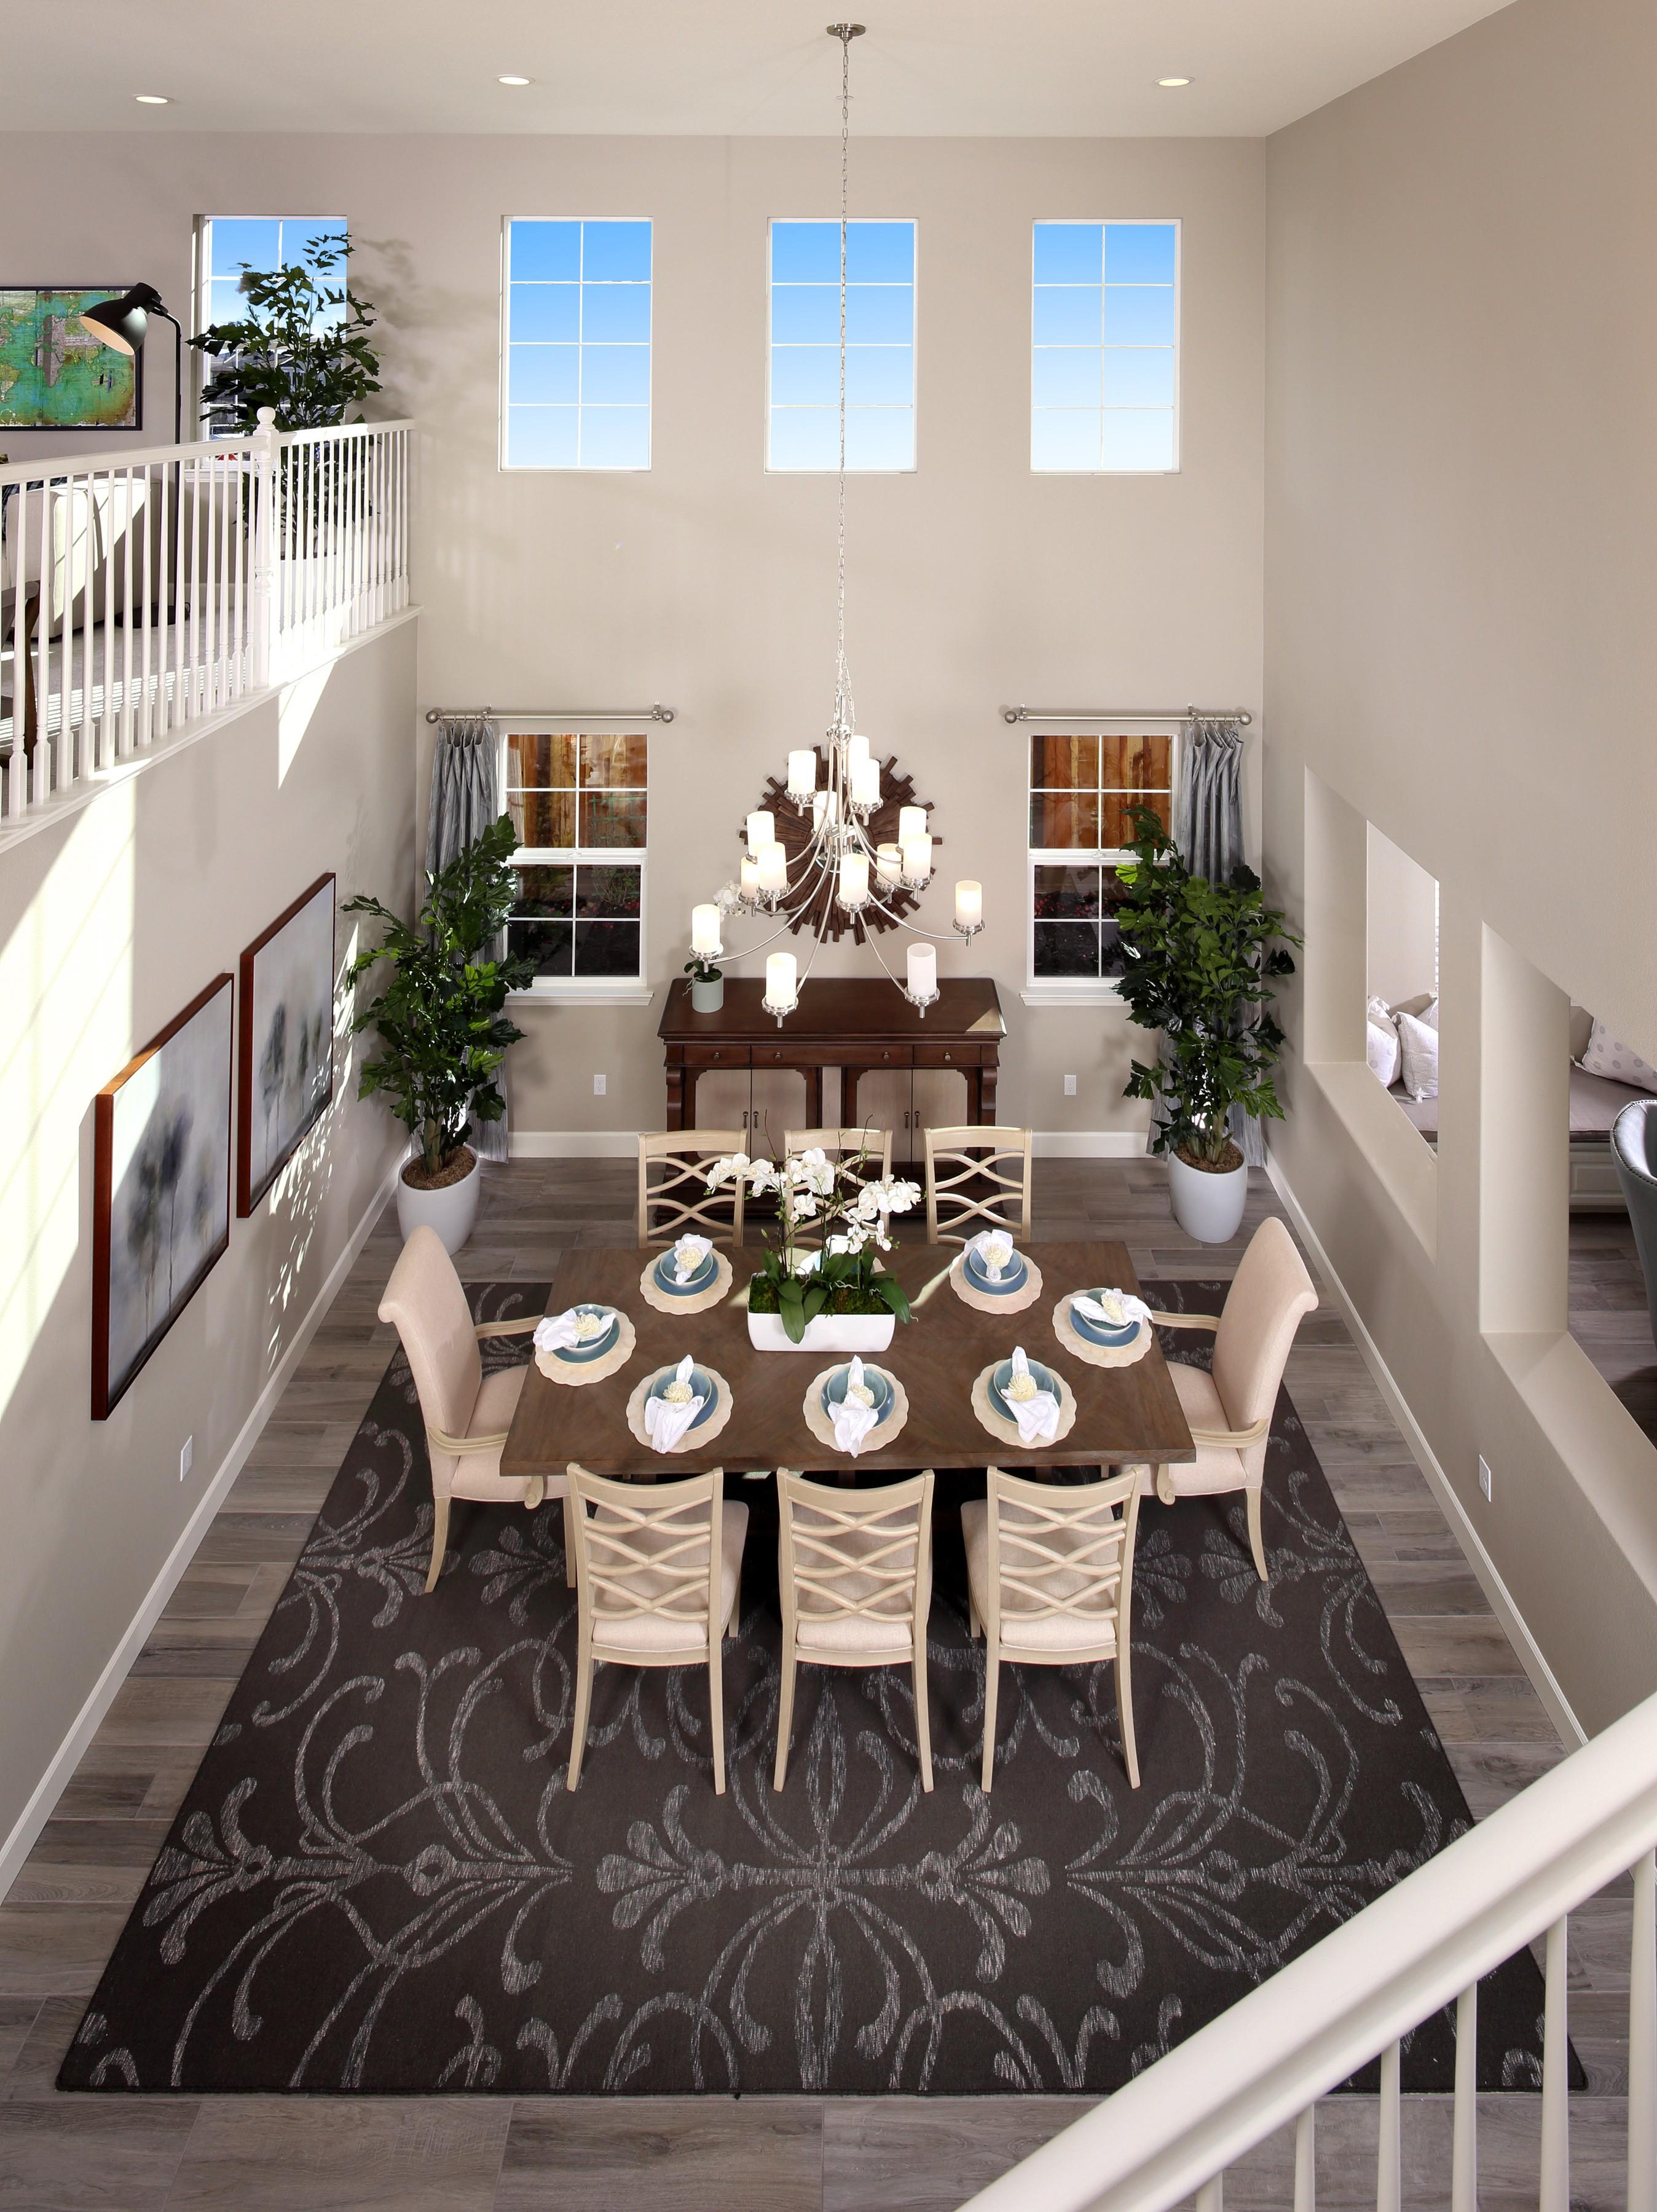 Dining room interior   Elite Builder Services